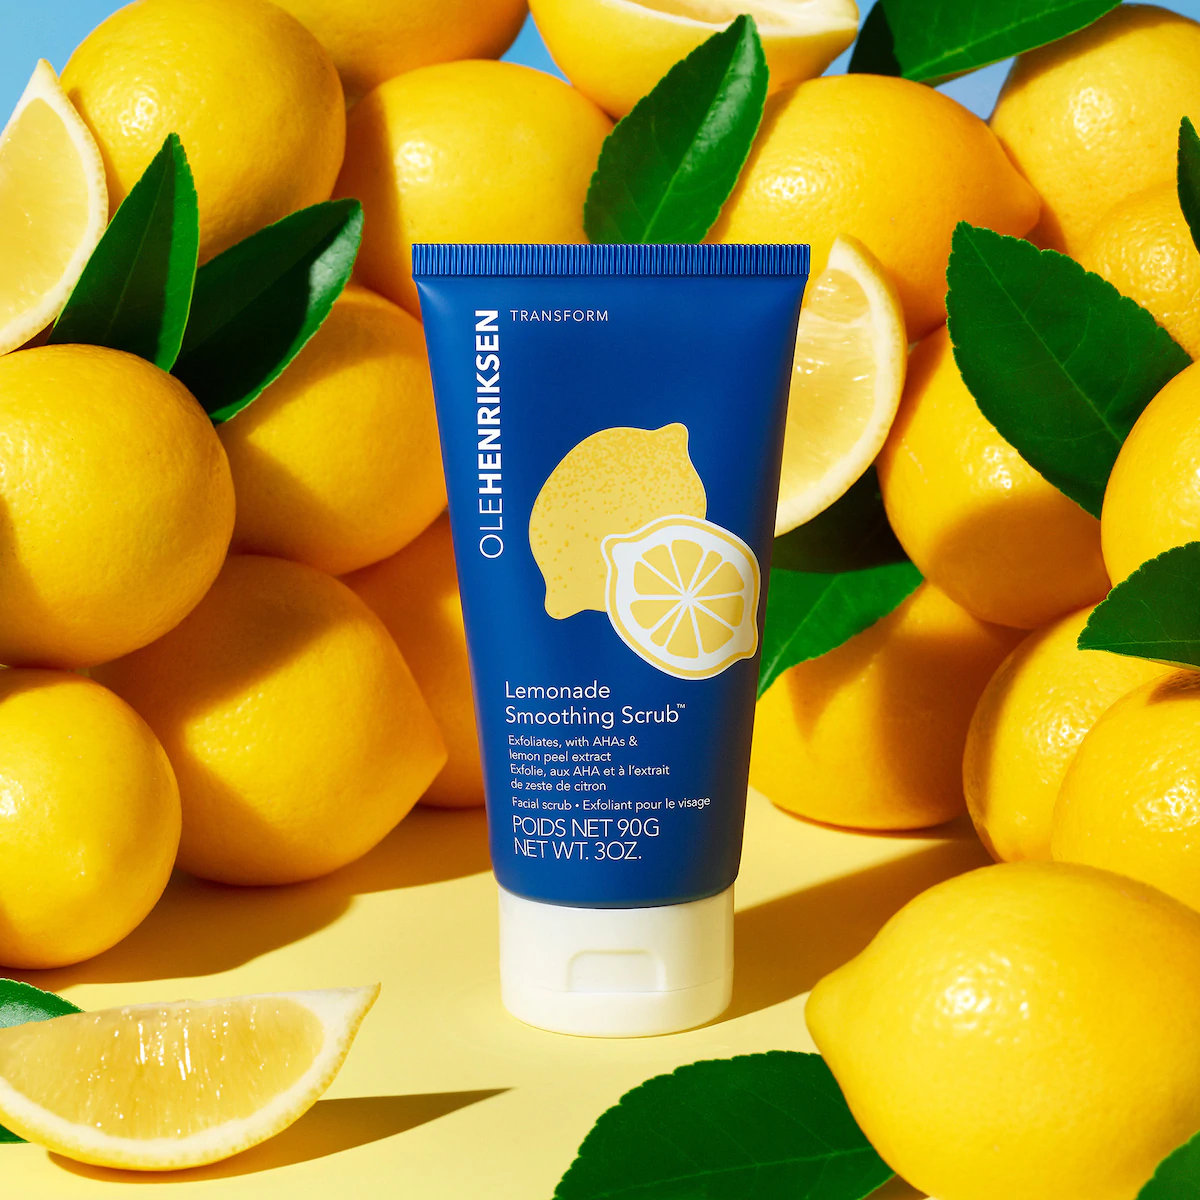 Ole Henriksen Lemonade Smoothing Scrub